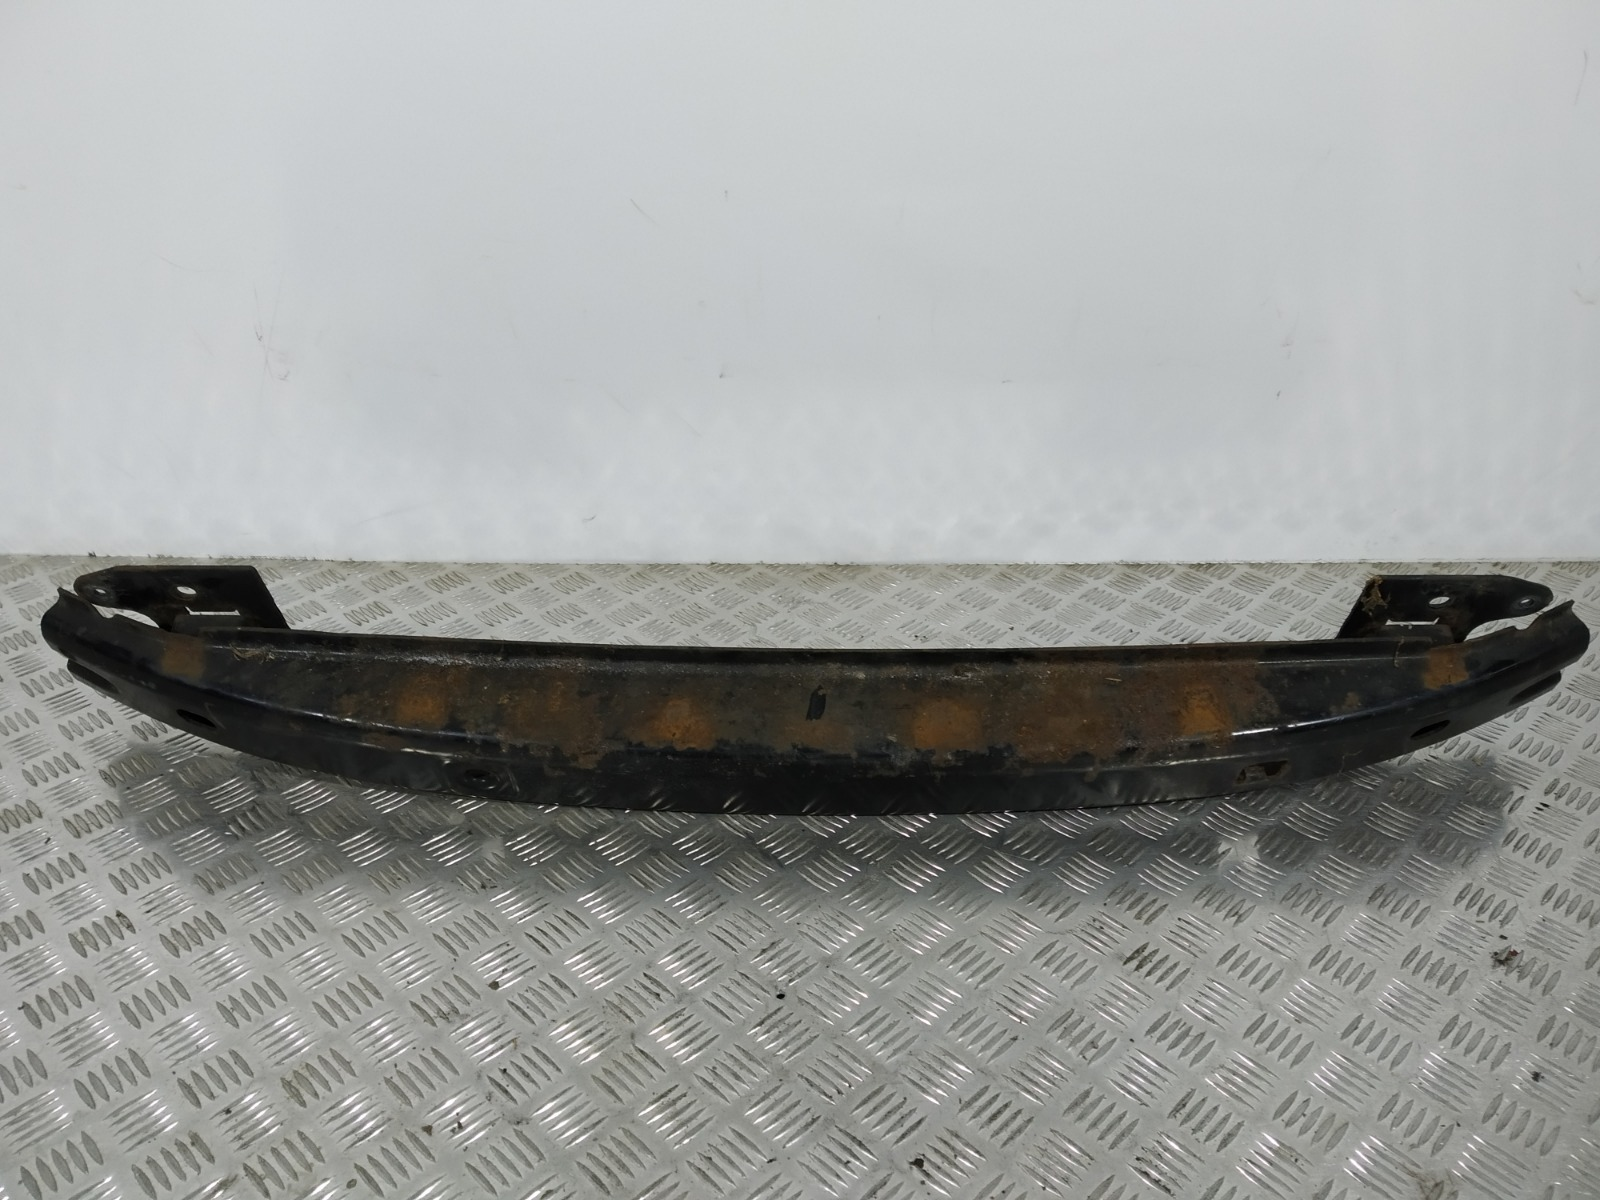 Усилитель бампера переднего Seat Alhambra 1.9 TDI 2002 (б/у)